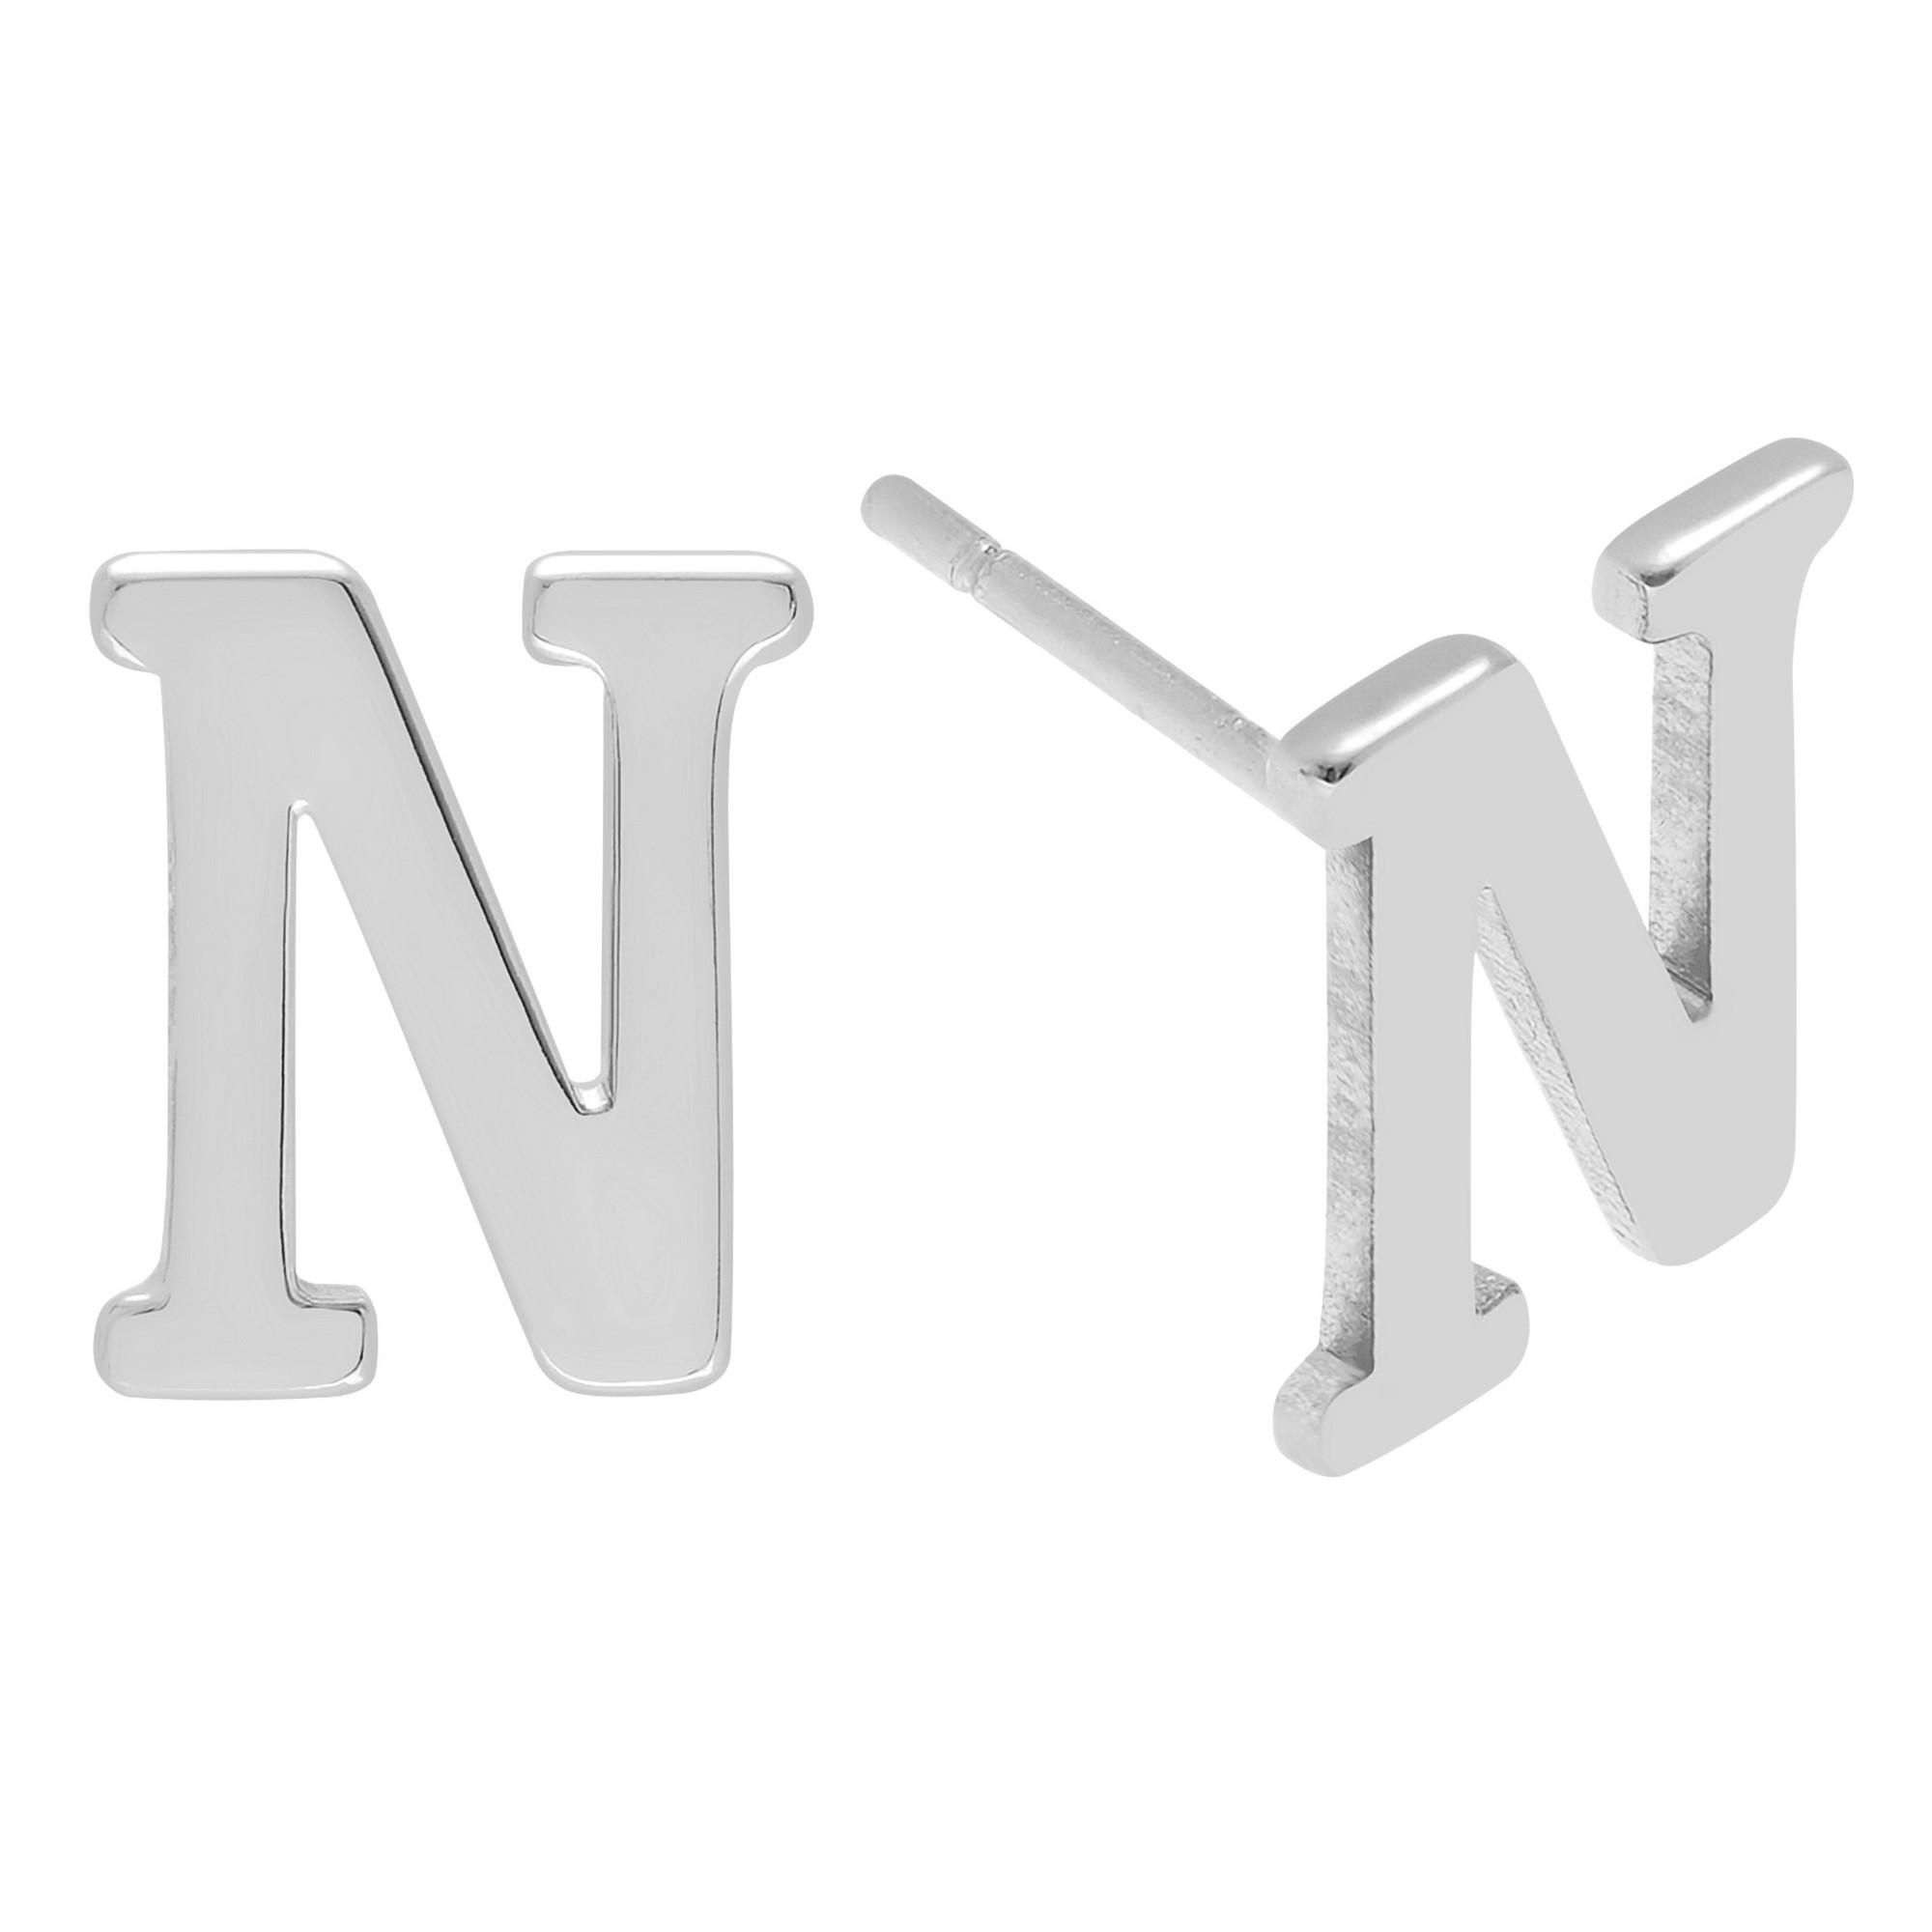 Women's Journee Collection Initial Stud Earrings in Sterling Silver - Silver, N, Silver Letter - N